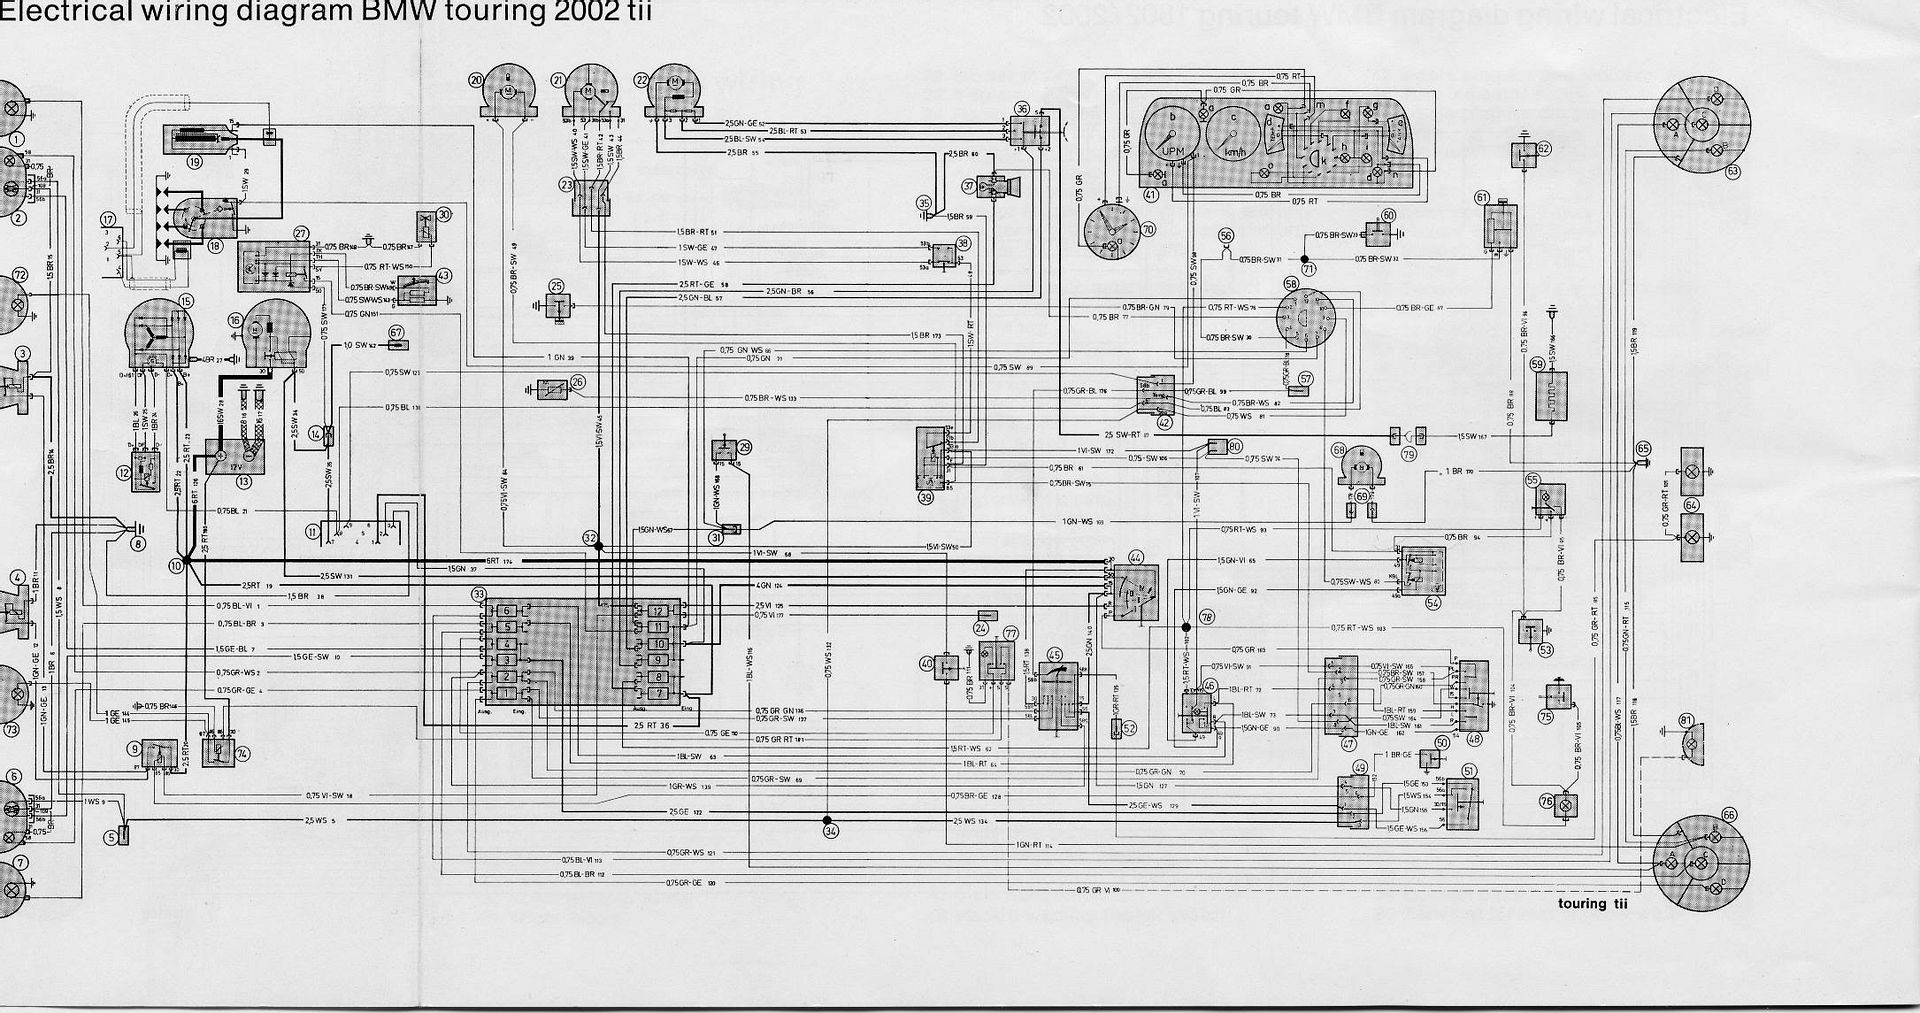 2004 Serria 6.0 Fuel Pump Wiring Bmw E46 Fuel Pump Wiring Diagram Full Hd Version Wiring Of 2004 Serria 6.0 Fuel Pump Wiring